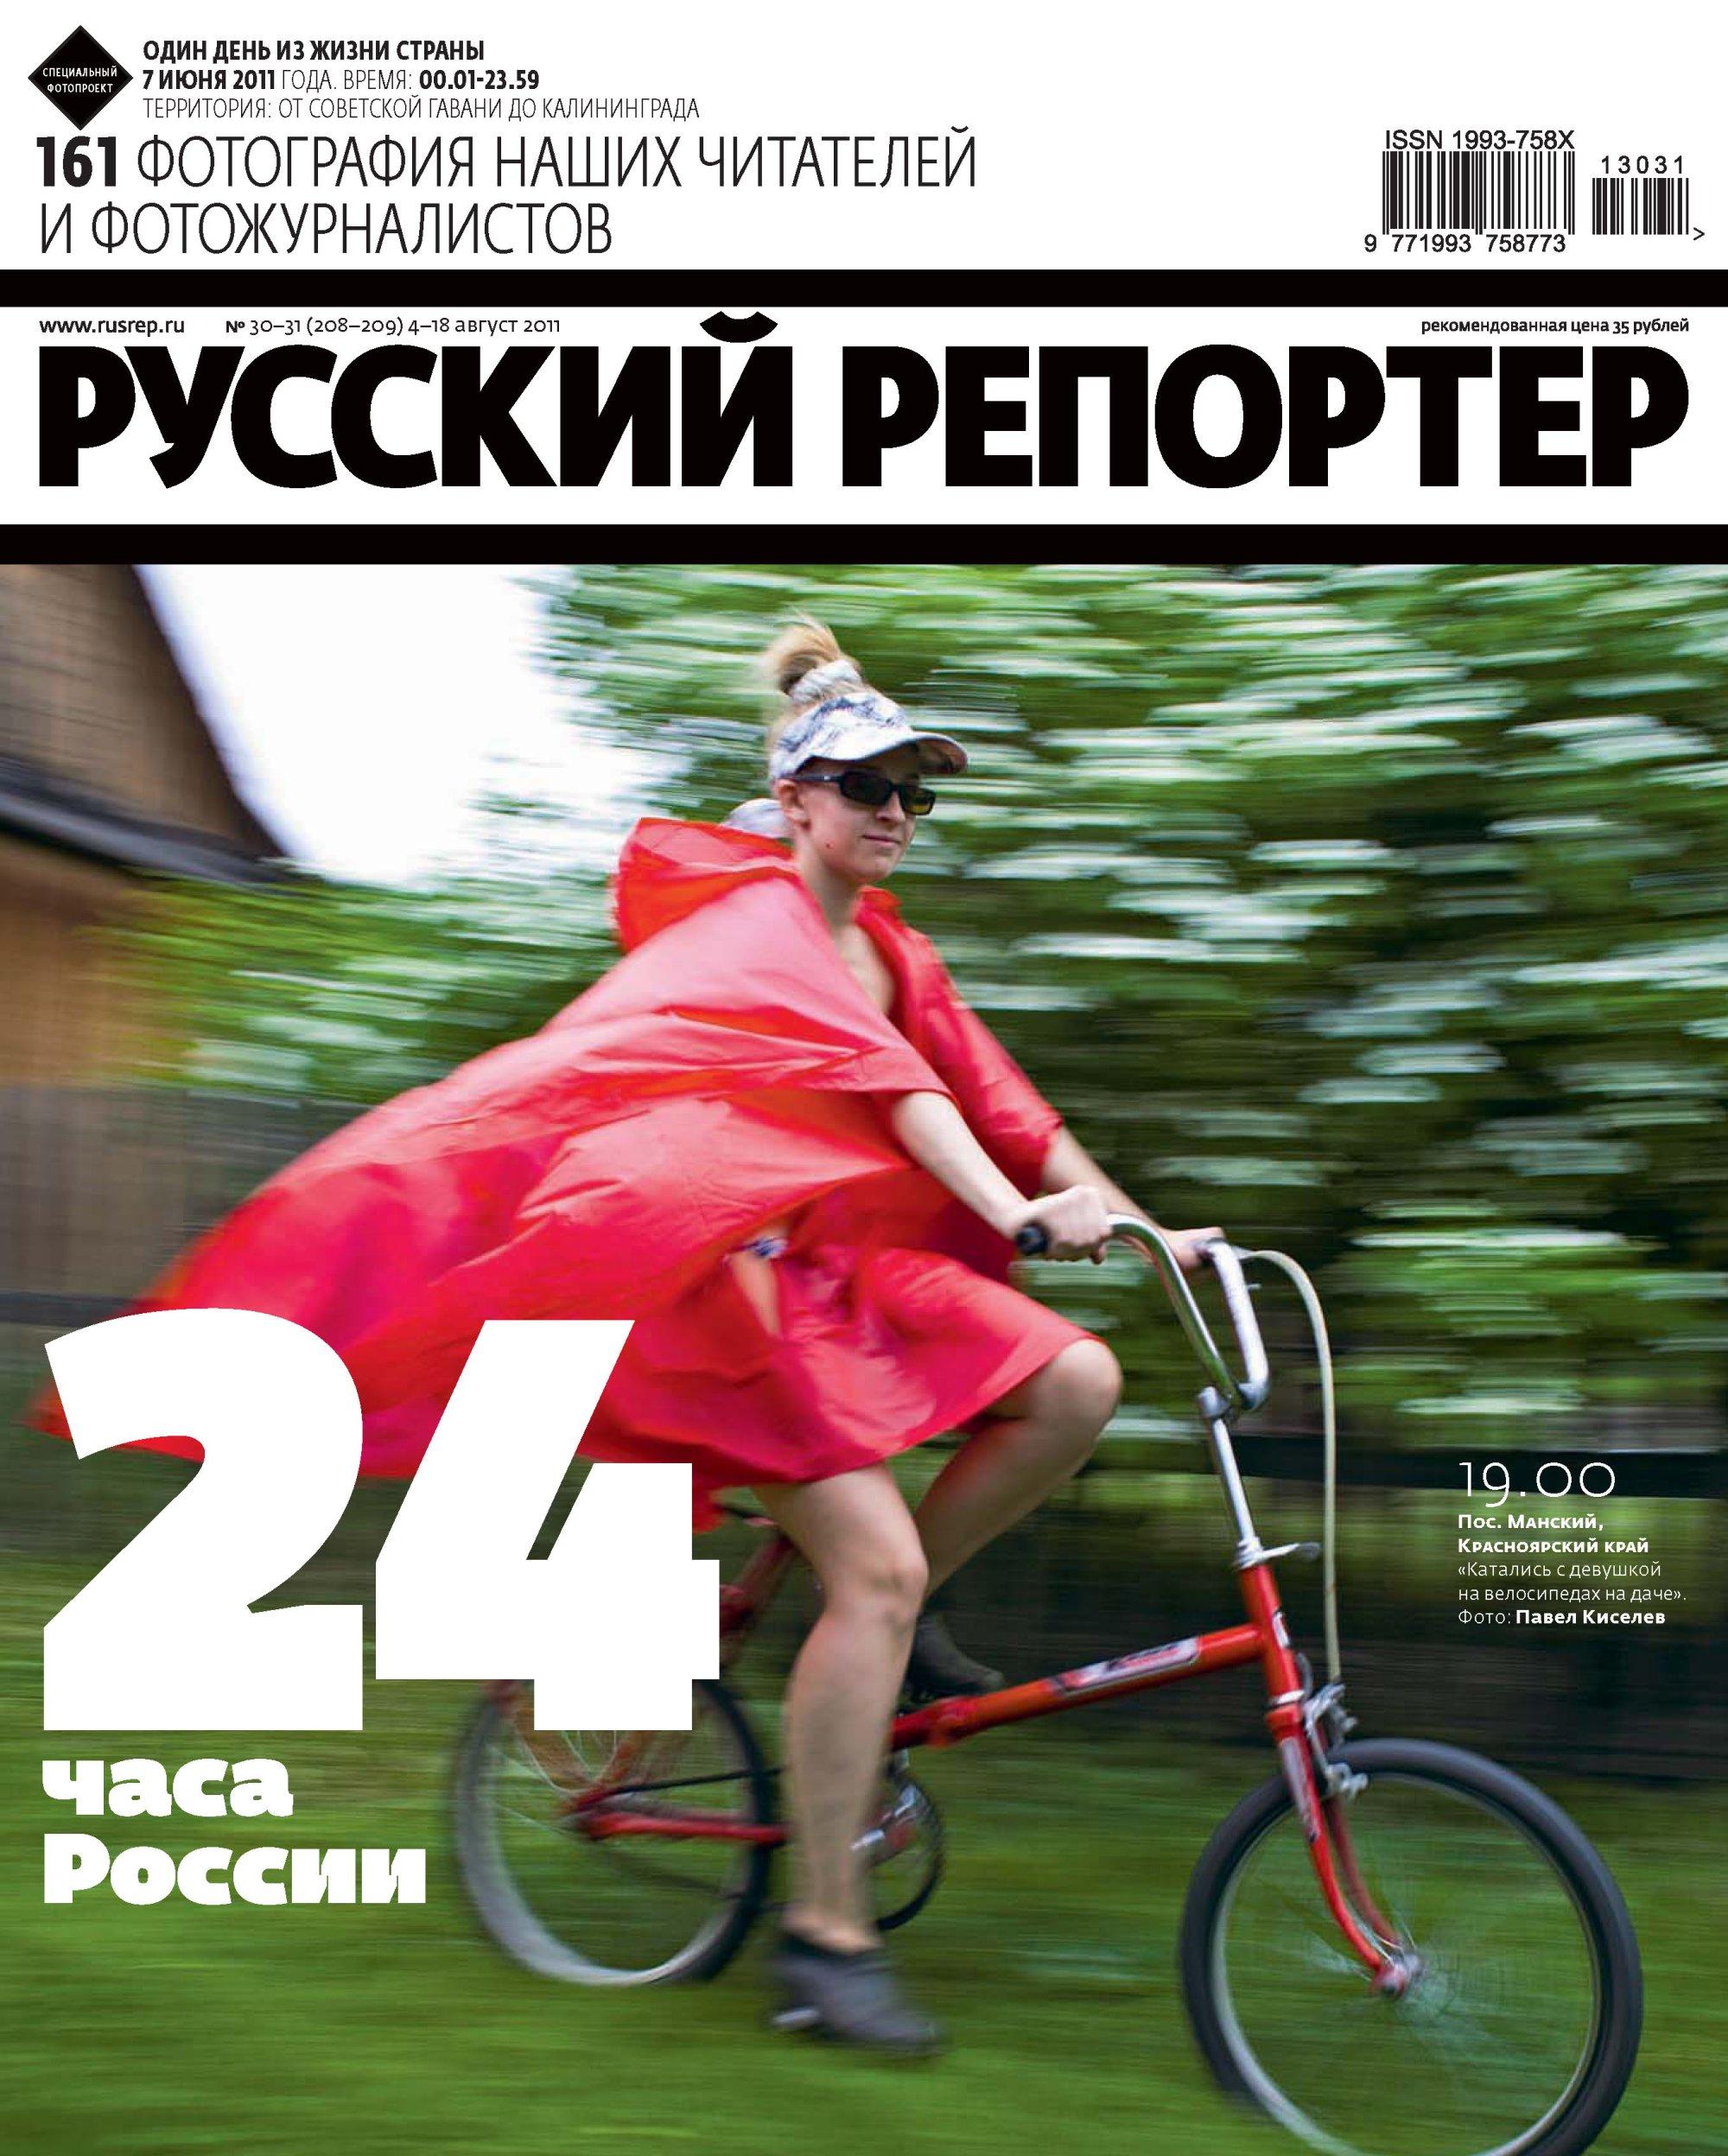 Русский Репортер № 30-31/2011